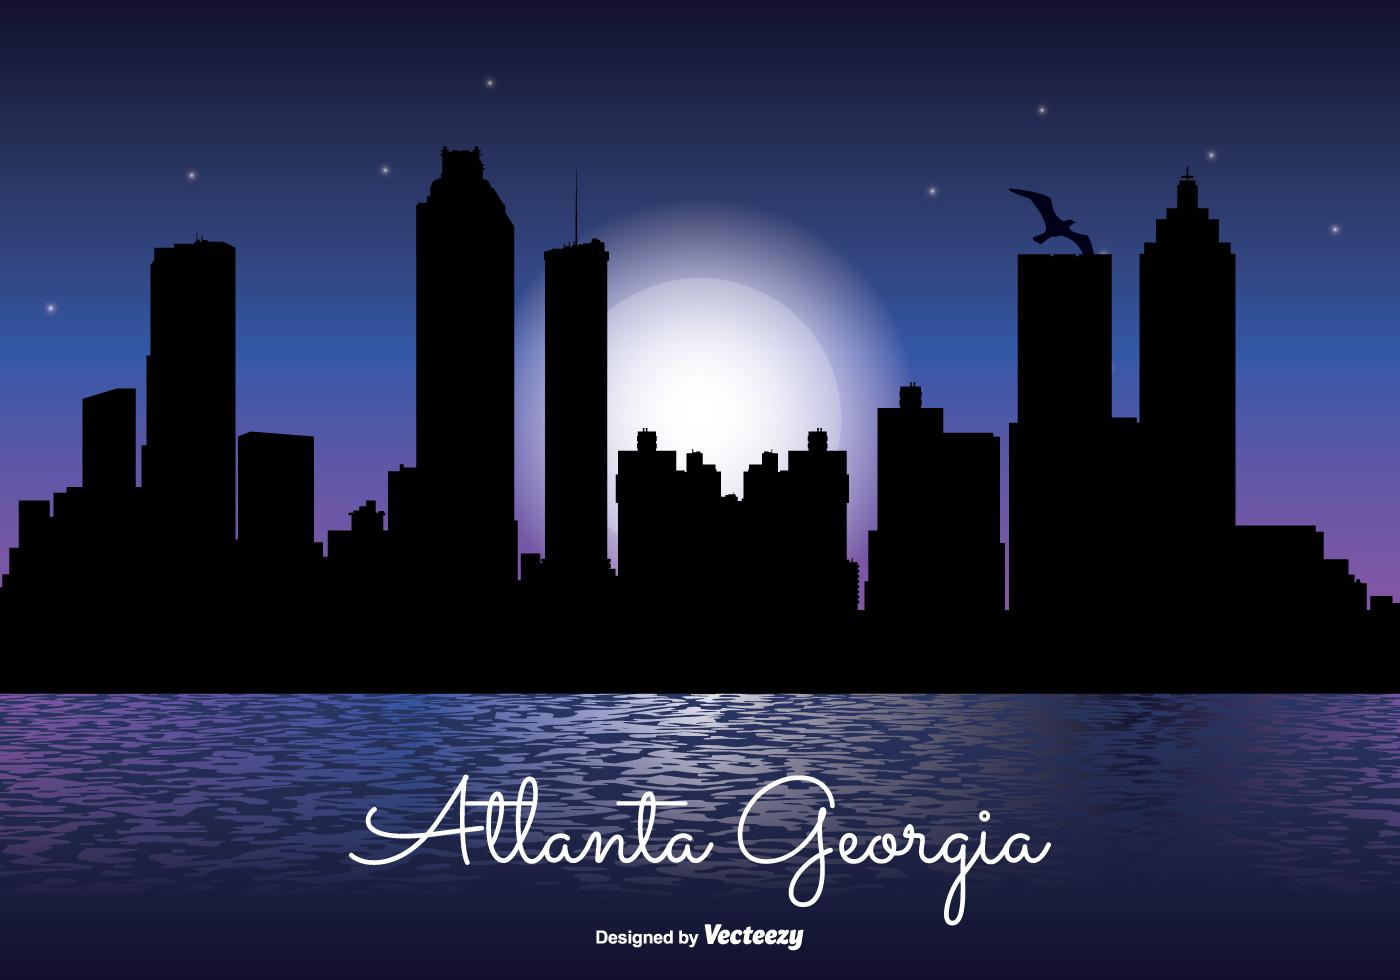 atlanta georgia night skyline illustration download free los angeles city skyline vector los angeles city skyline vector